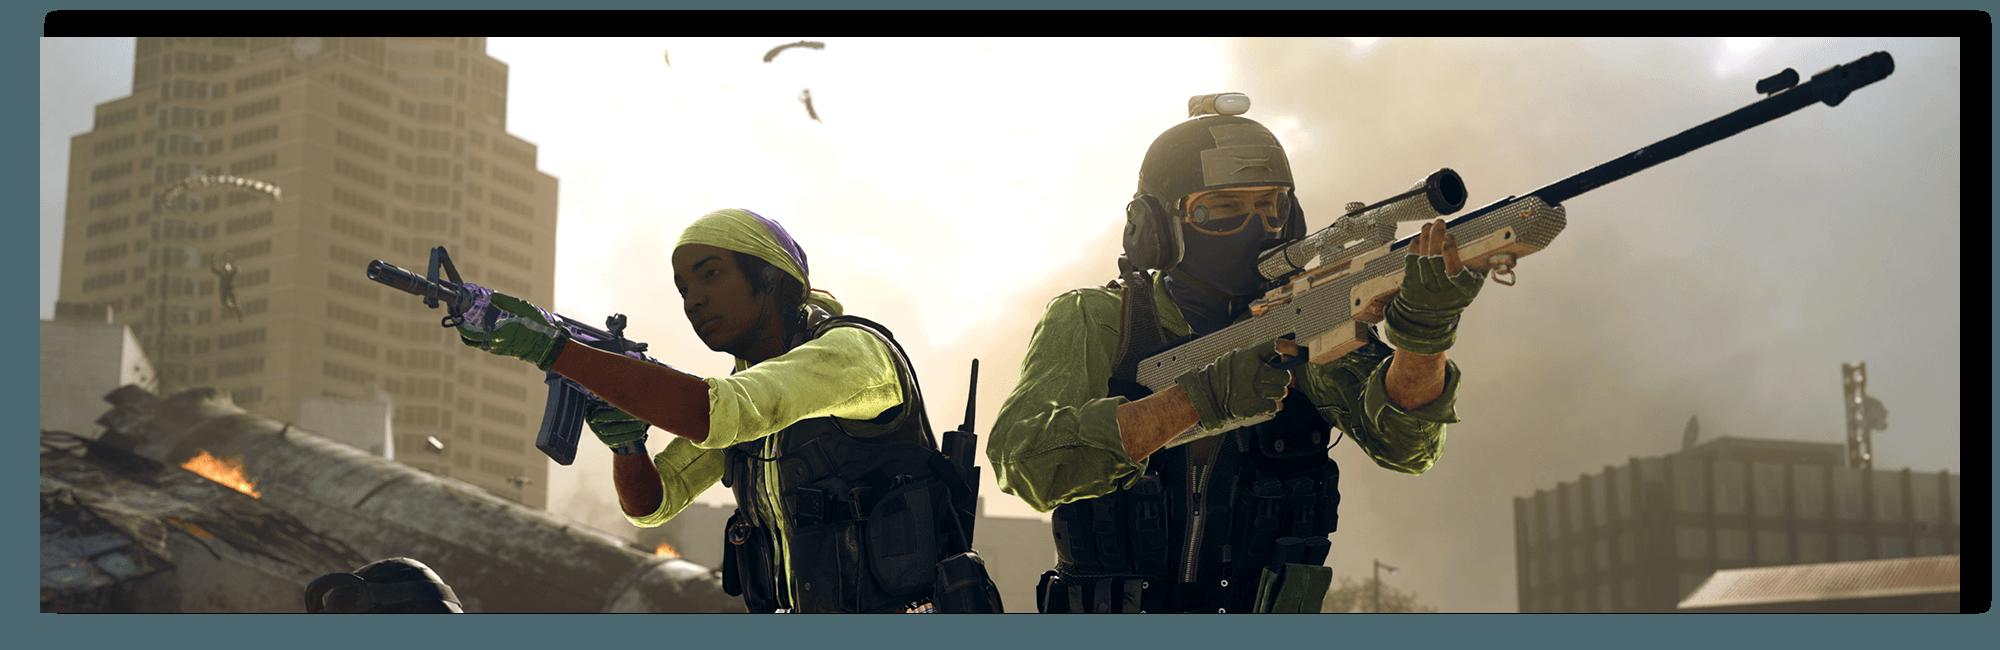 Banner image of Operators preparing for battle.